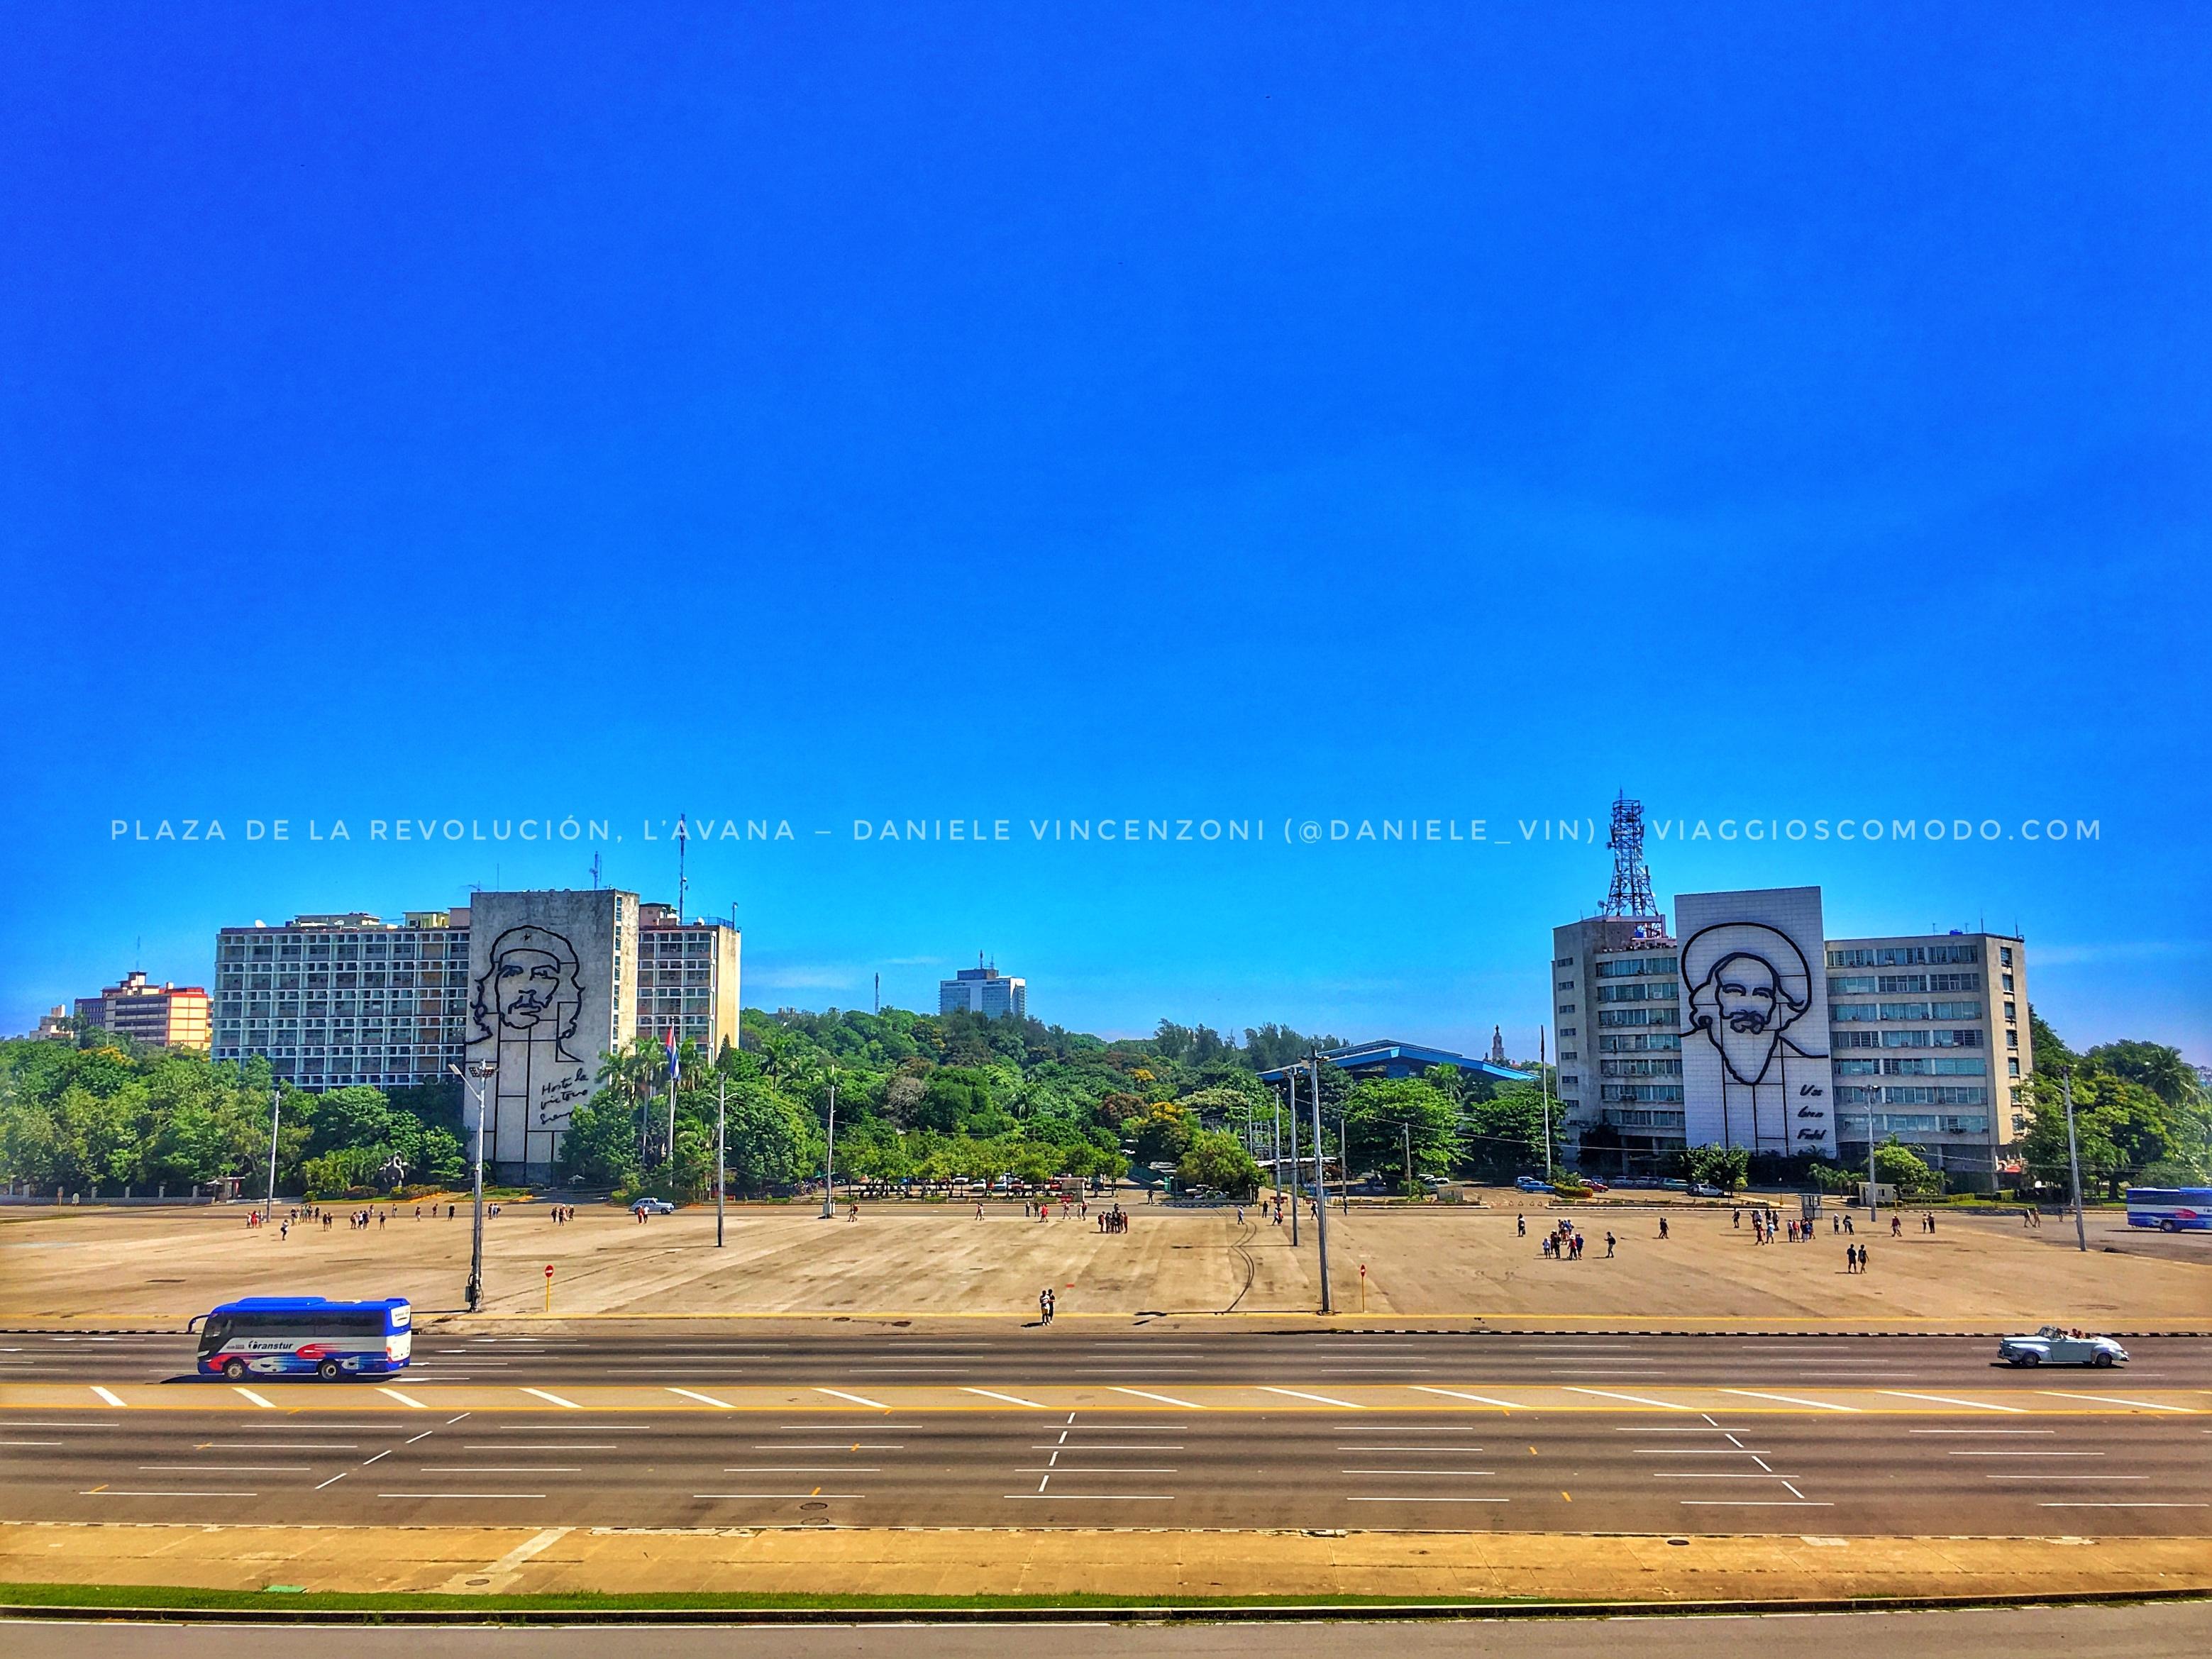 Plaza de la Revolucion - Vedado - L'Avana - Cuba